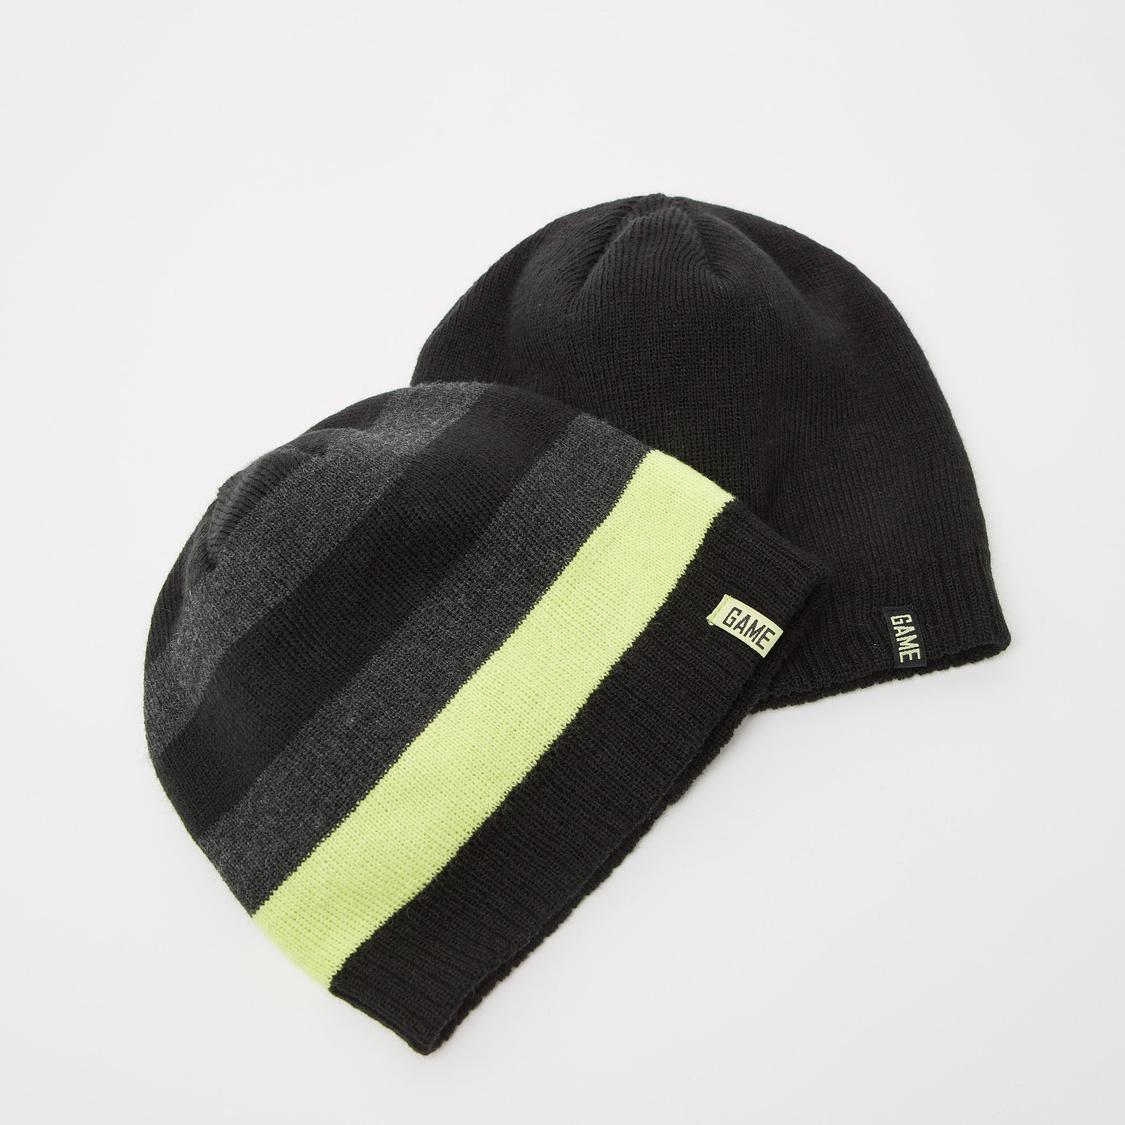 Set of 2 - Assorted Beanie Caps